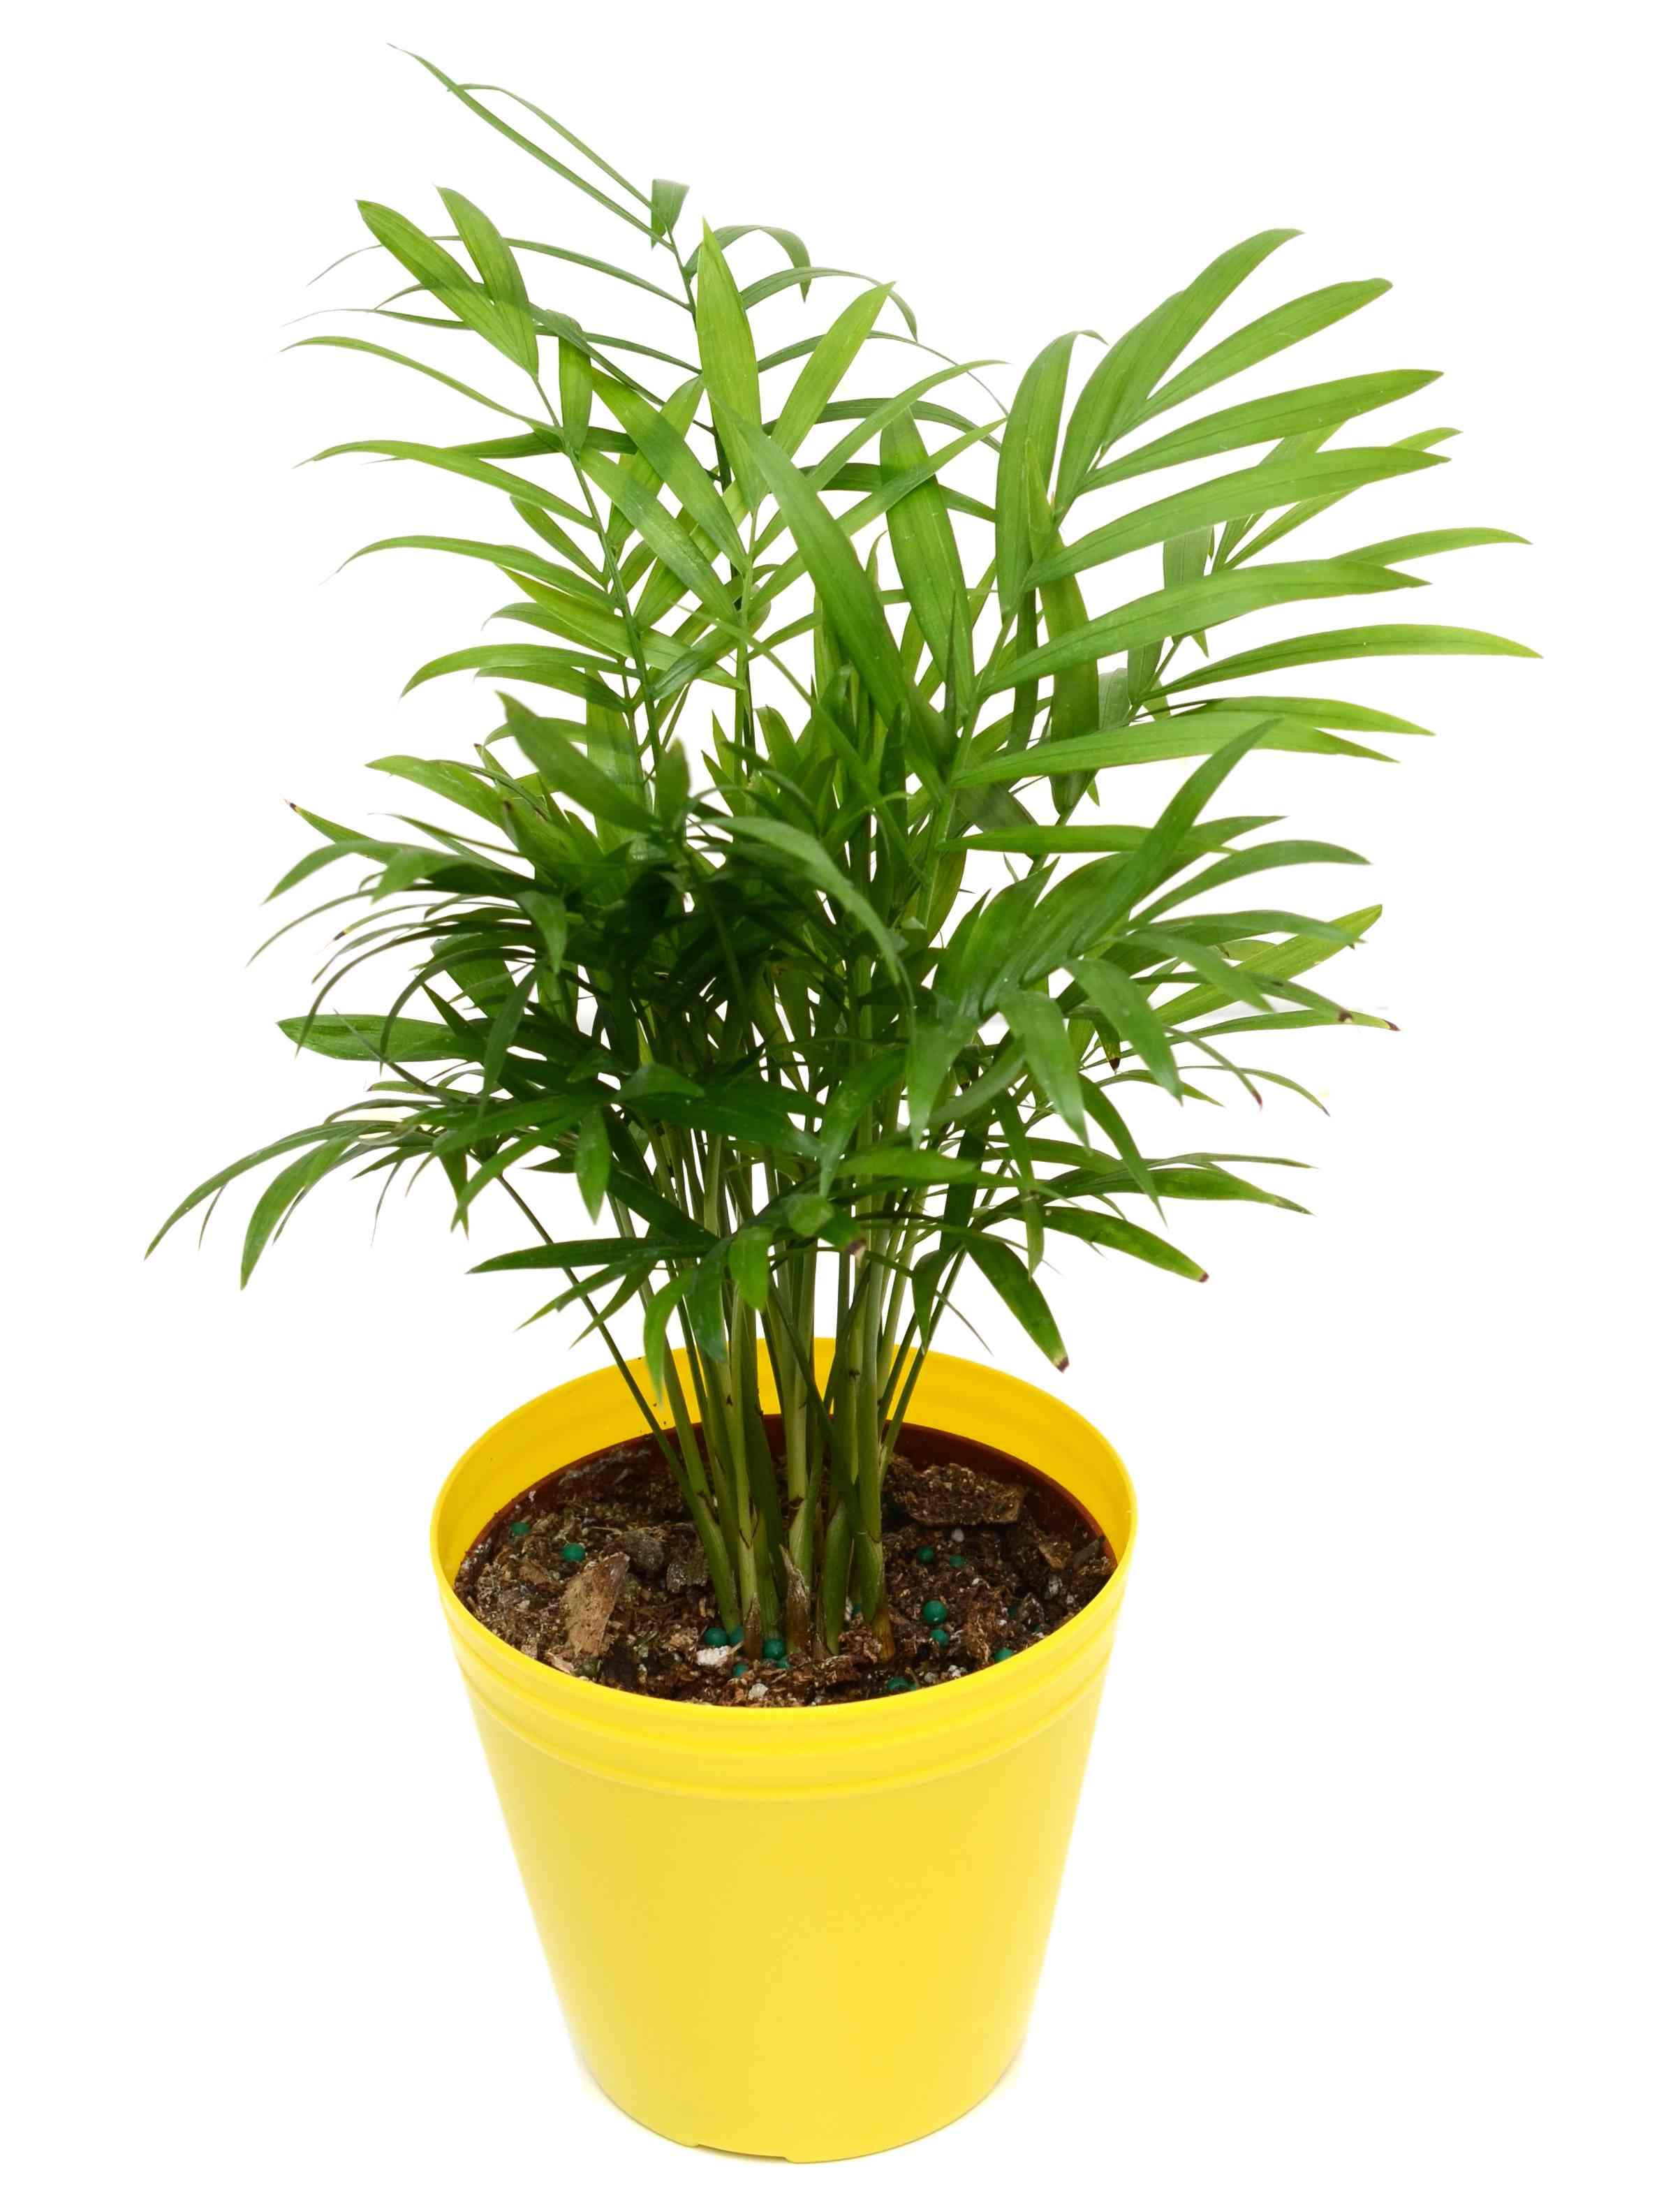 Green palm foliage tree isolated